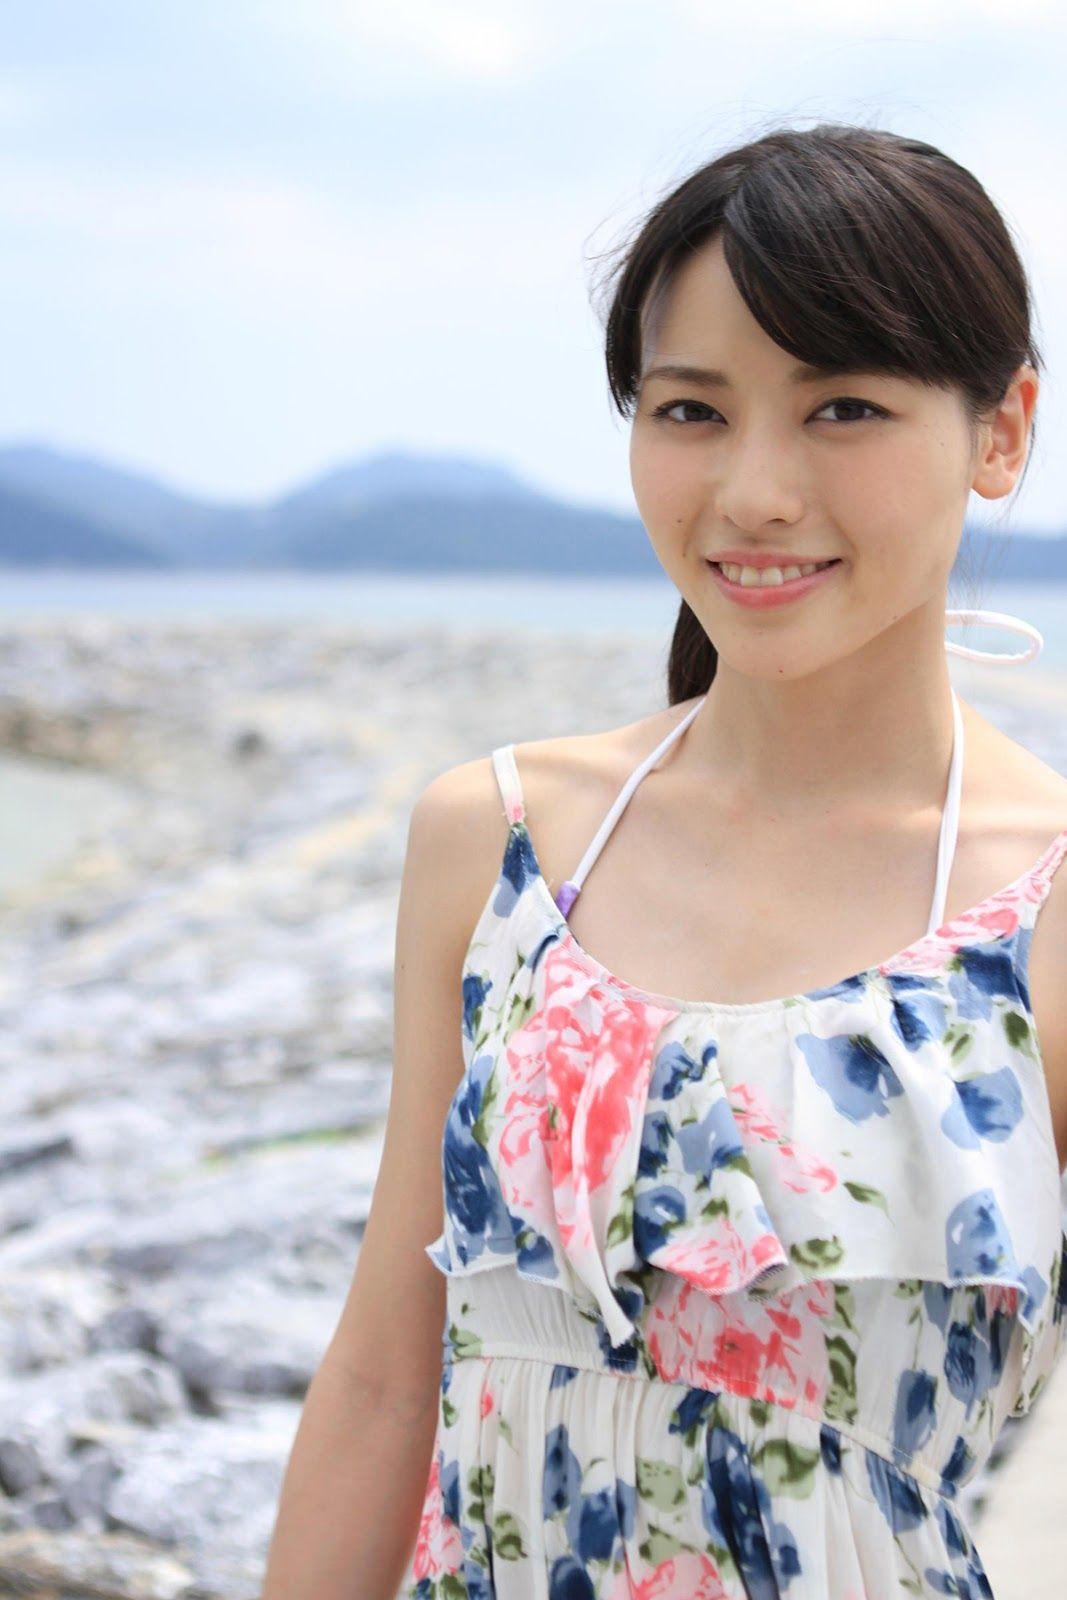 imouto.tv minisuka.tv  Imouto.tv,Minisuka.tv,Japanese Girls,Victoria Secret Collection,Japanese